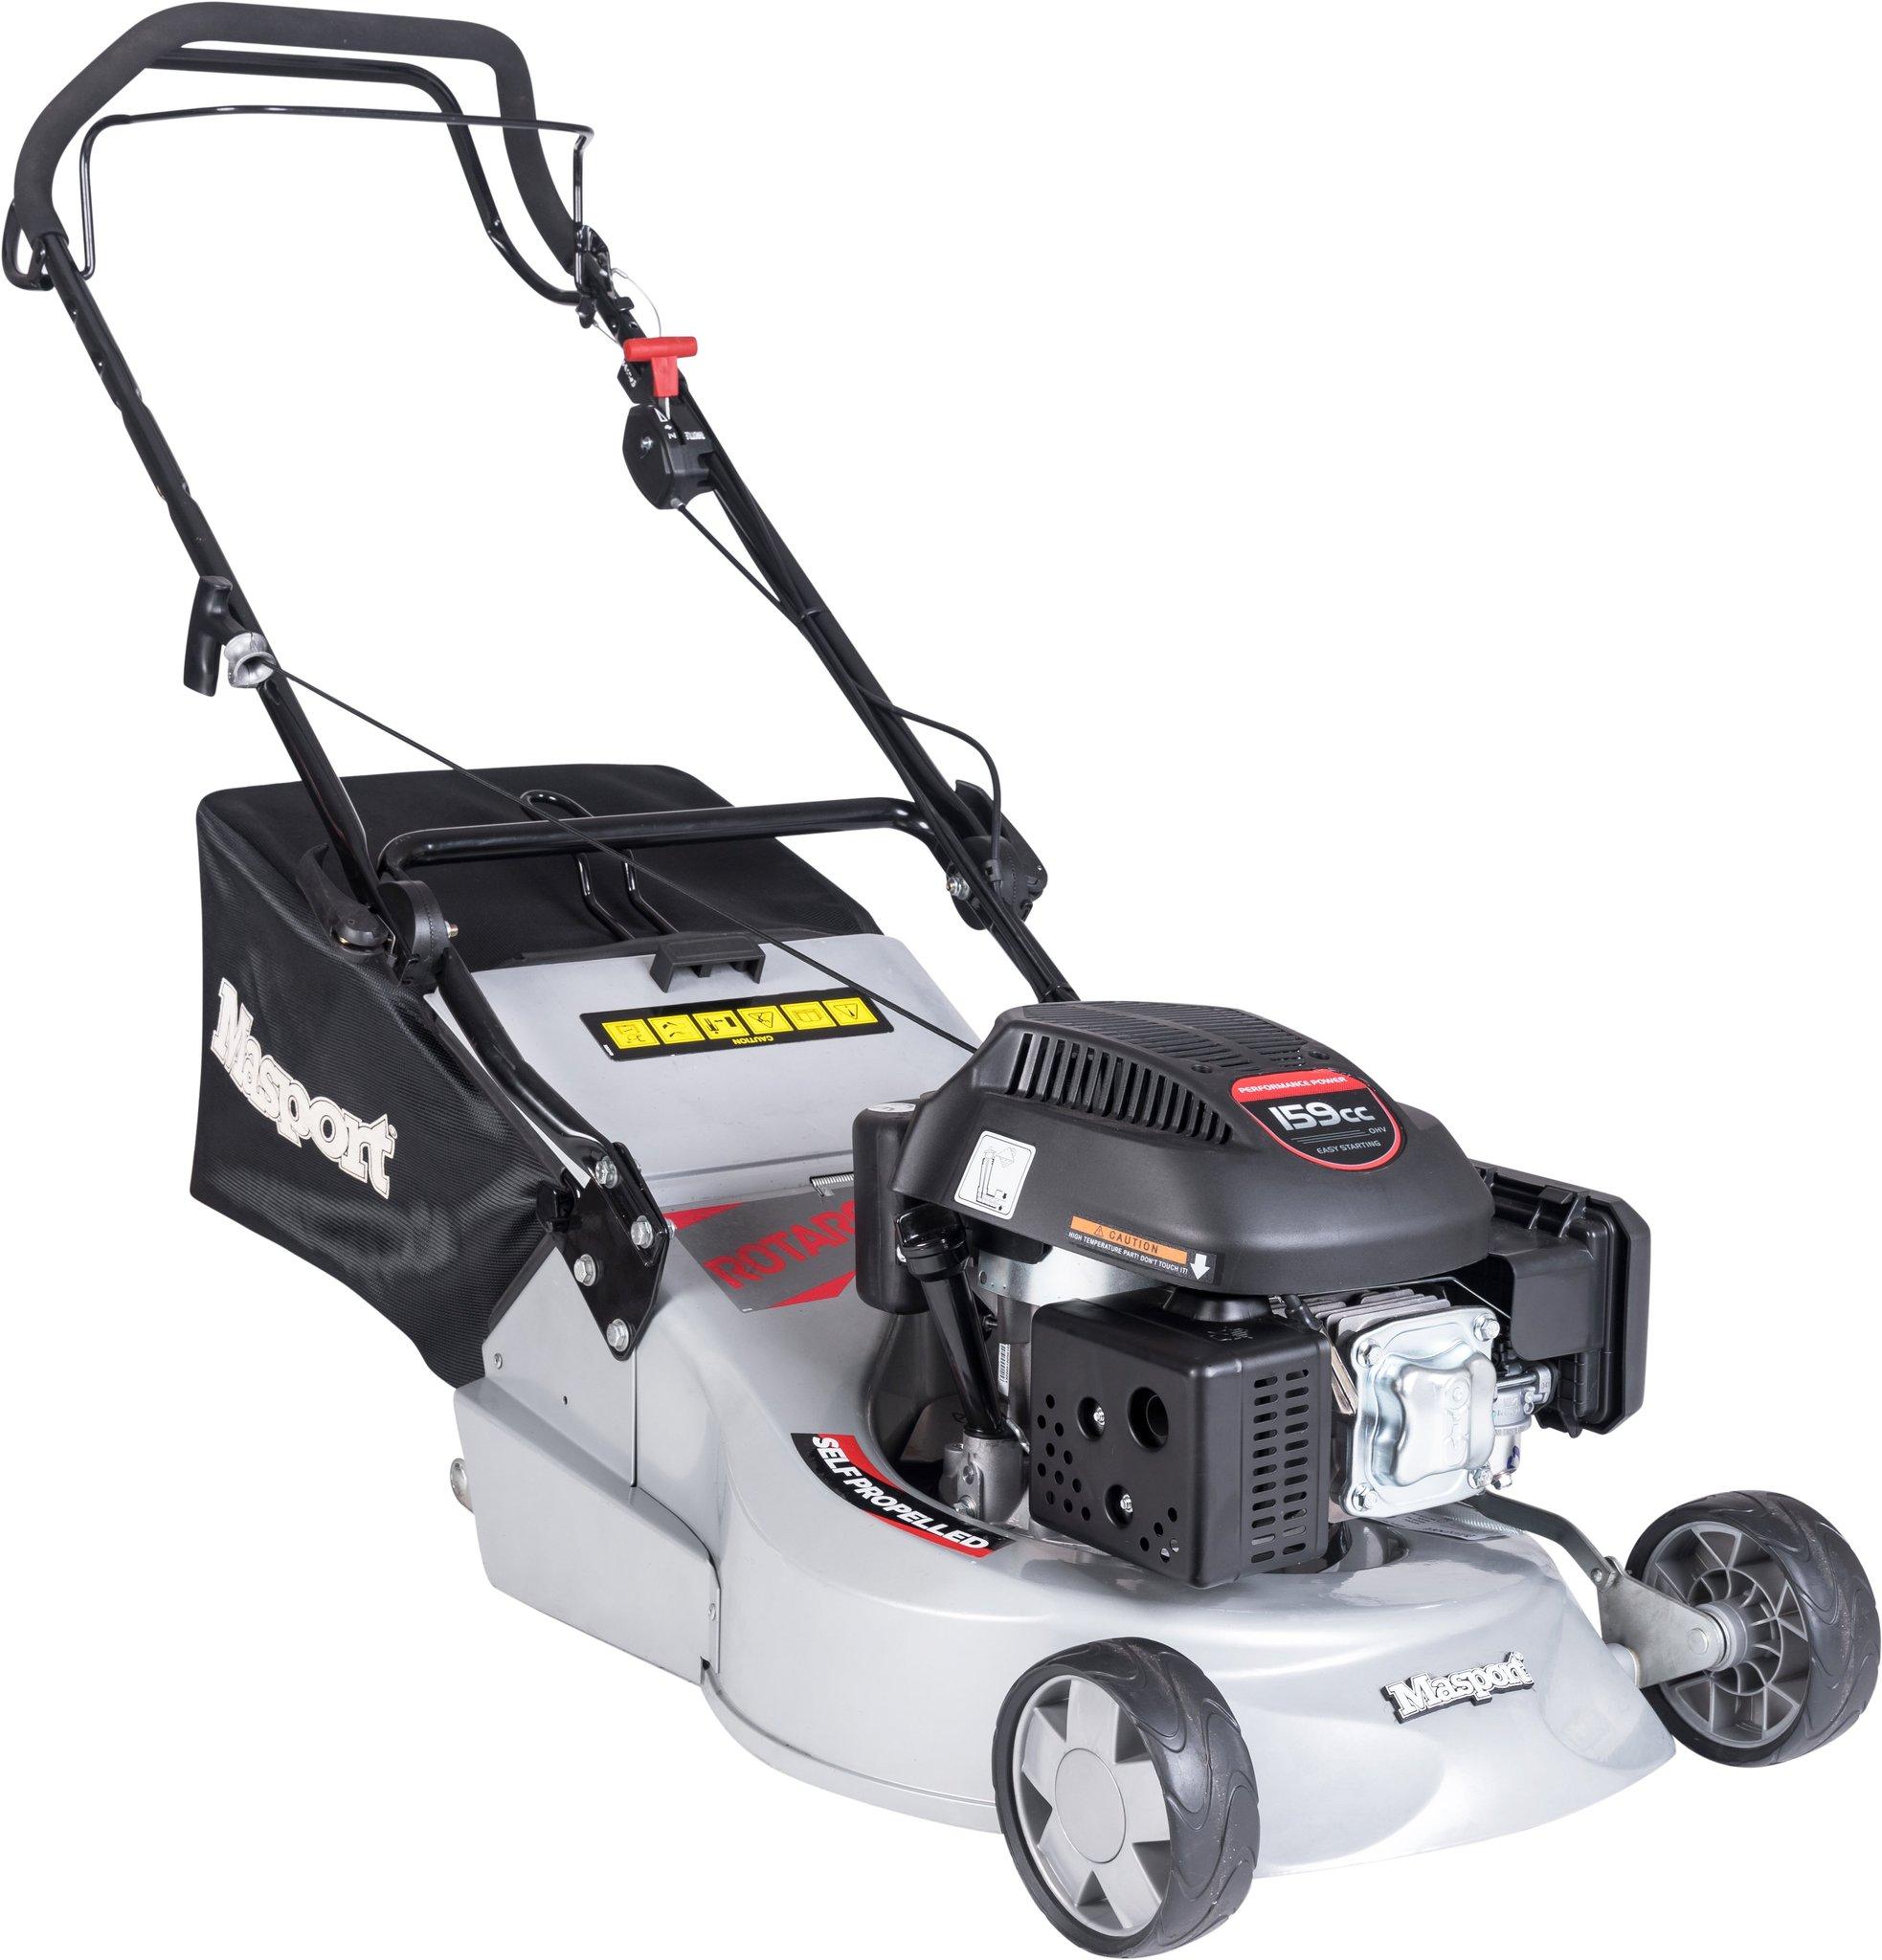 masport RRSP 18L roller mower